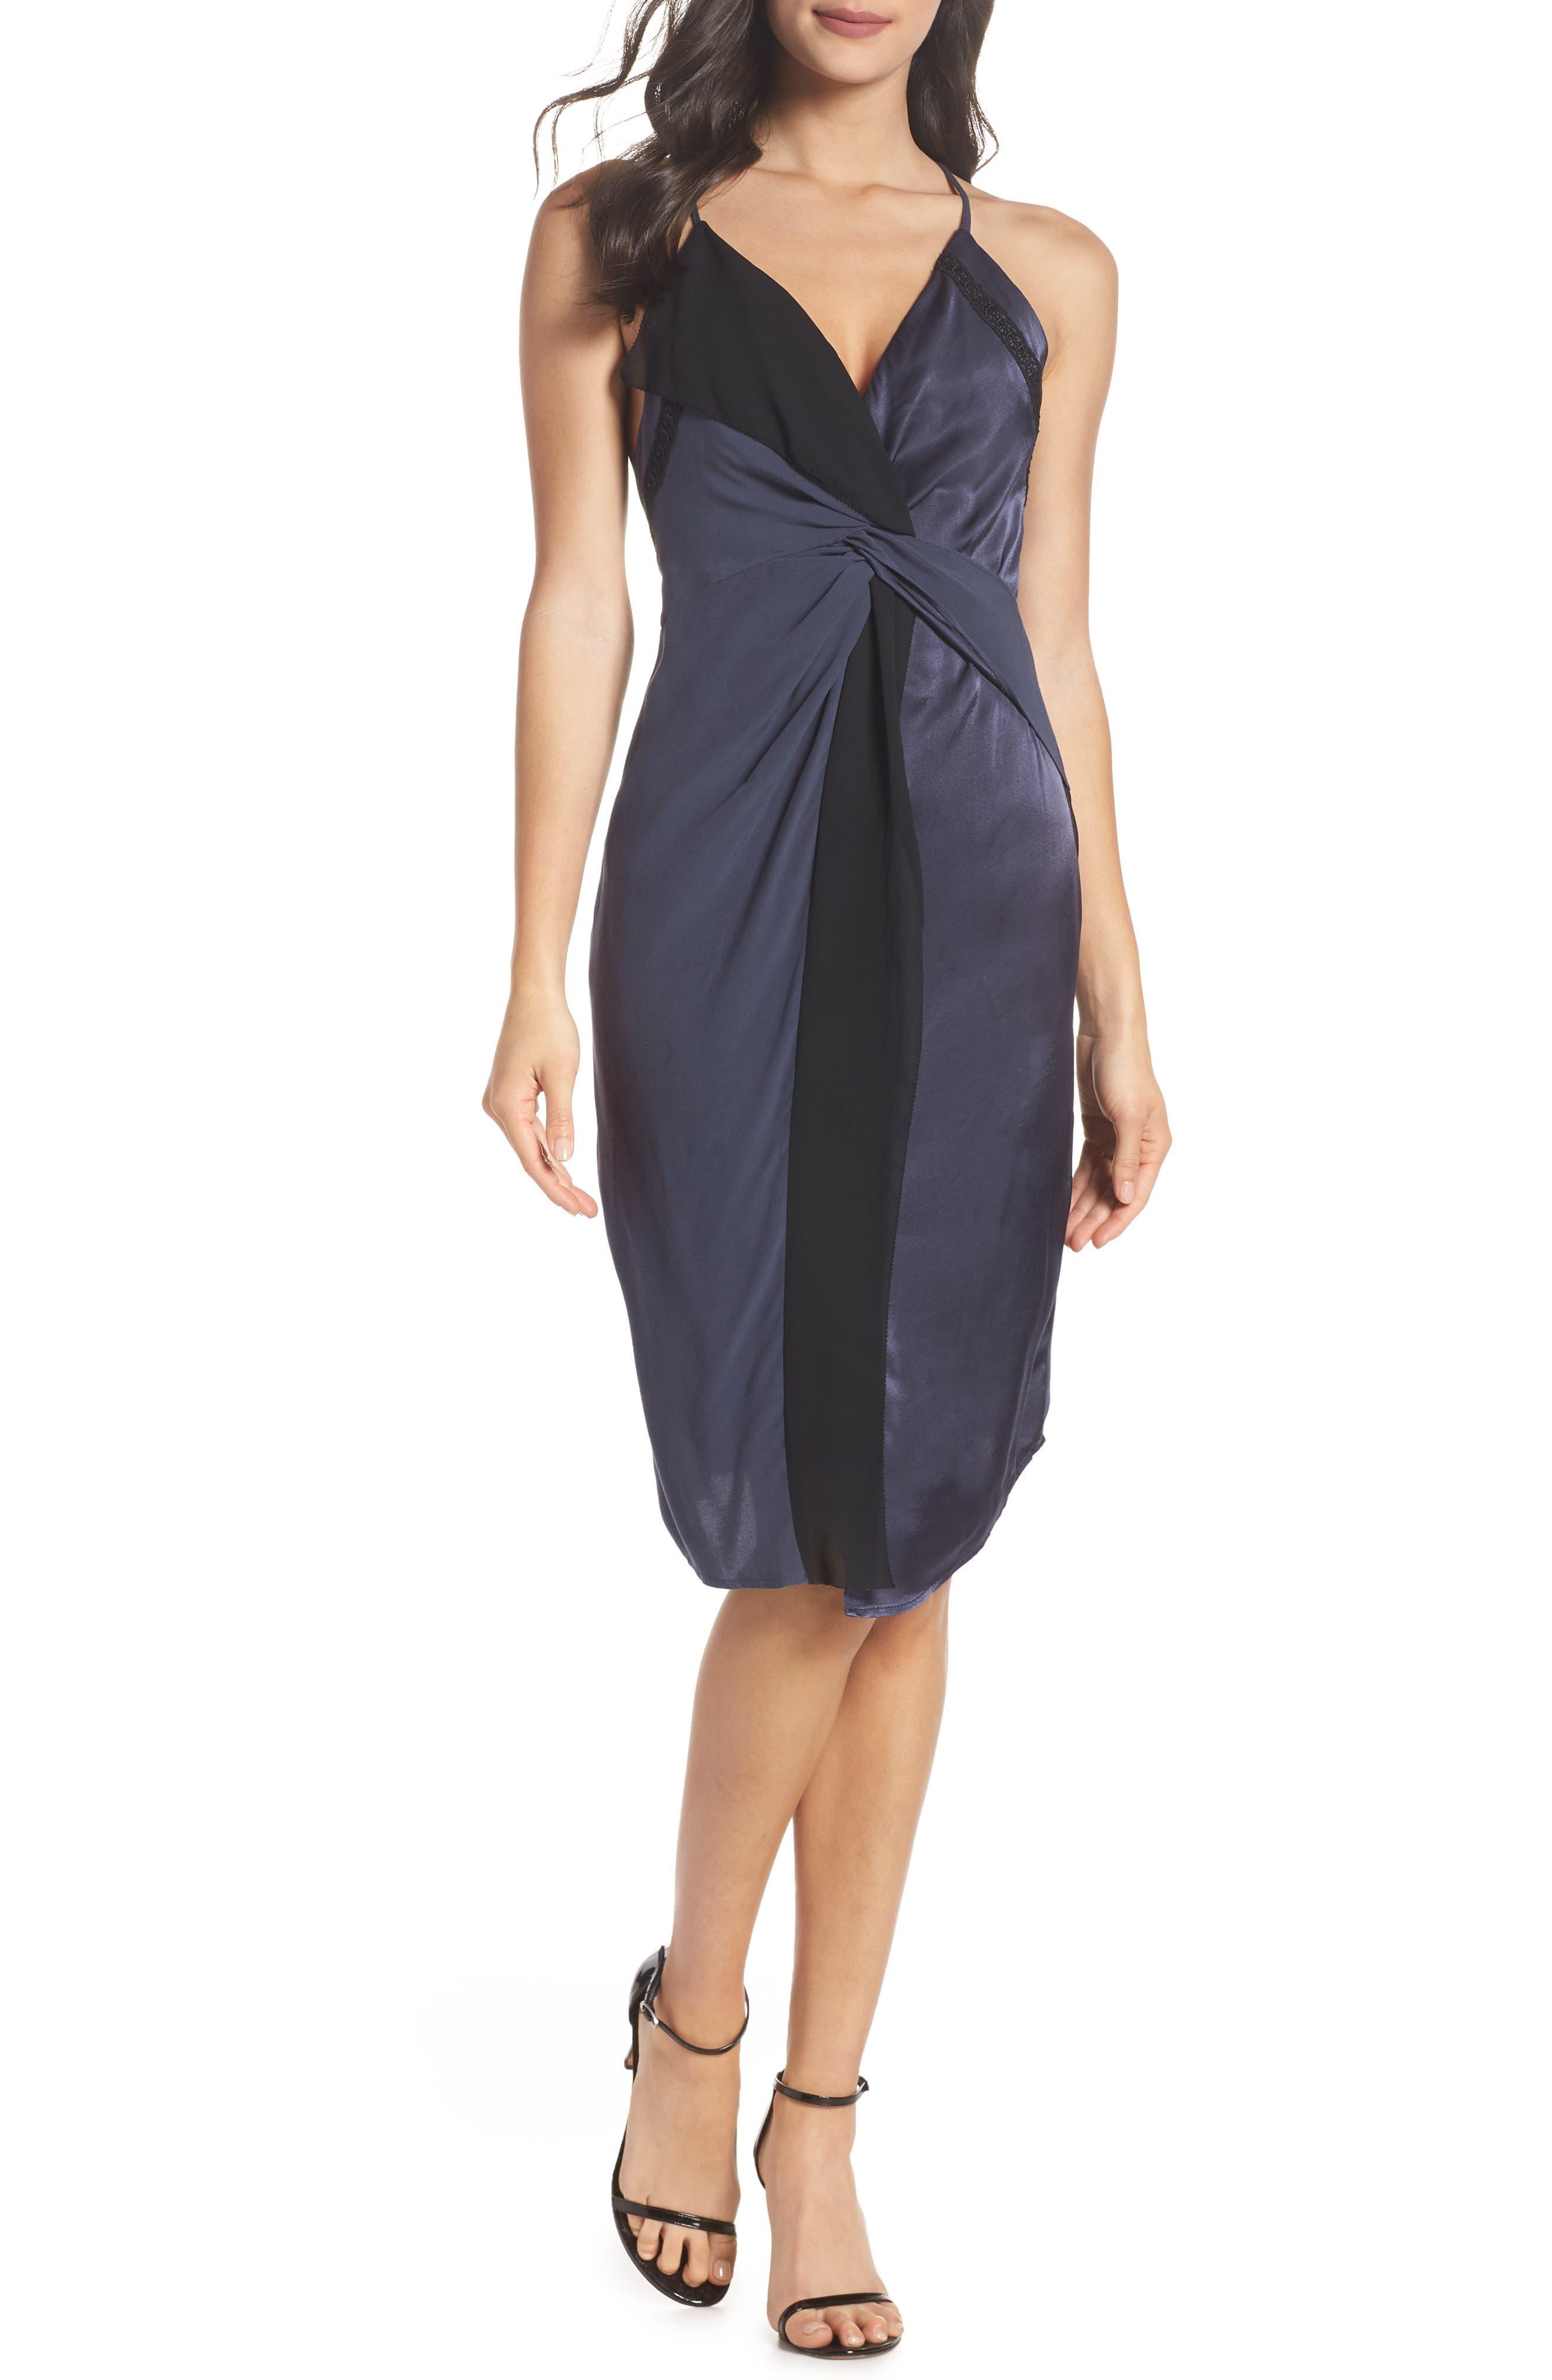 Twist Front Cocktail Dress,                         Main,                         color, BLACK/ NAVY